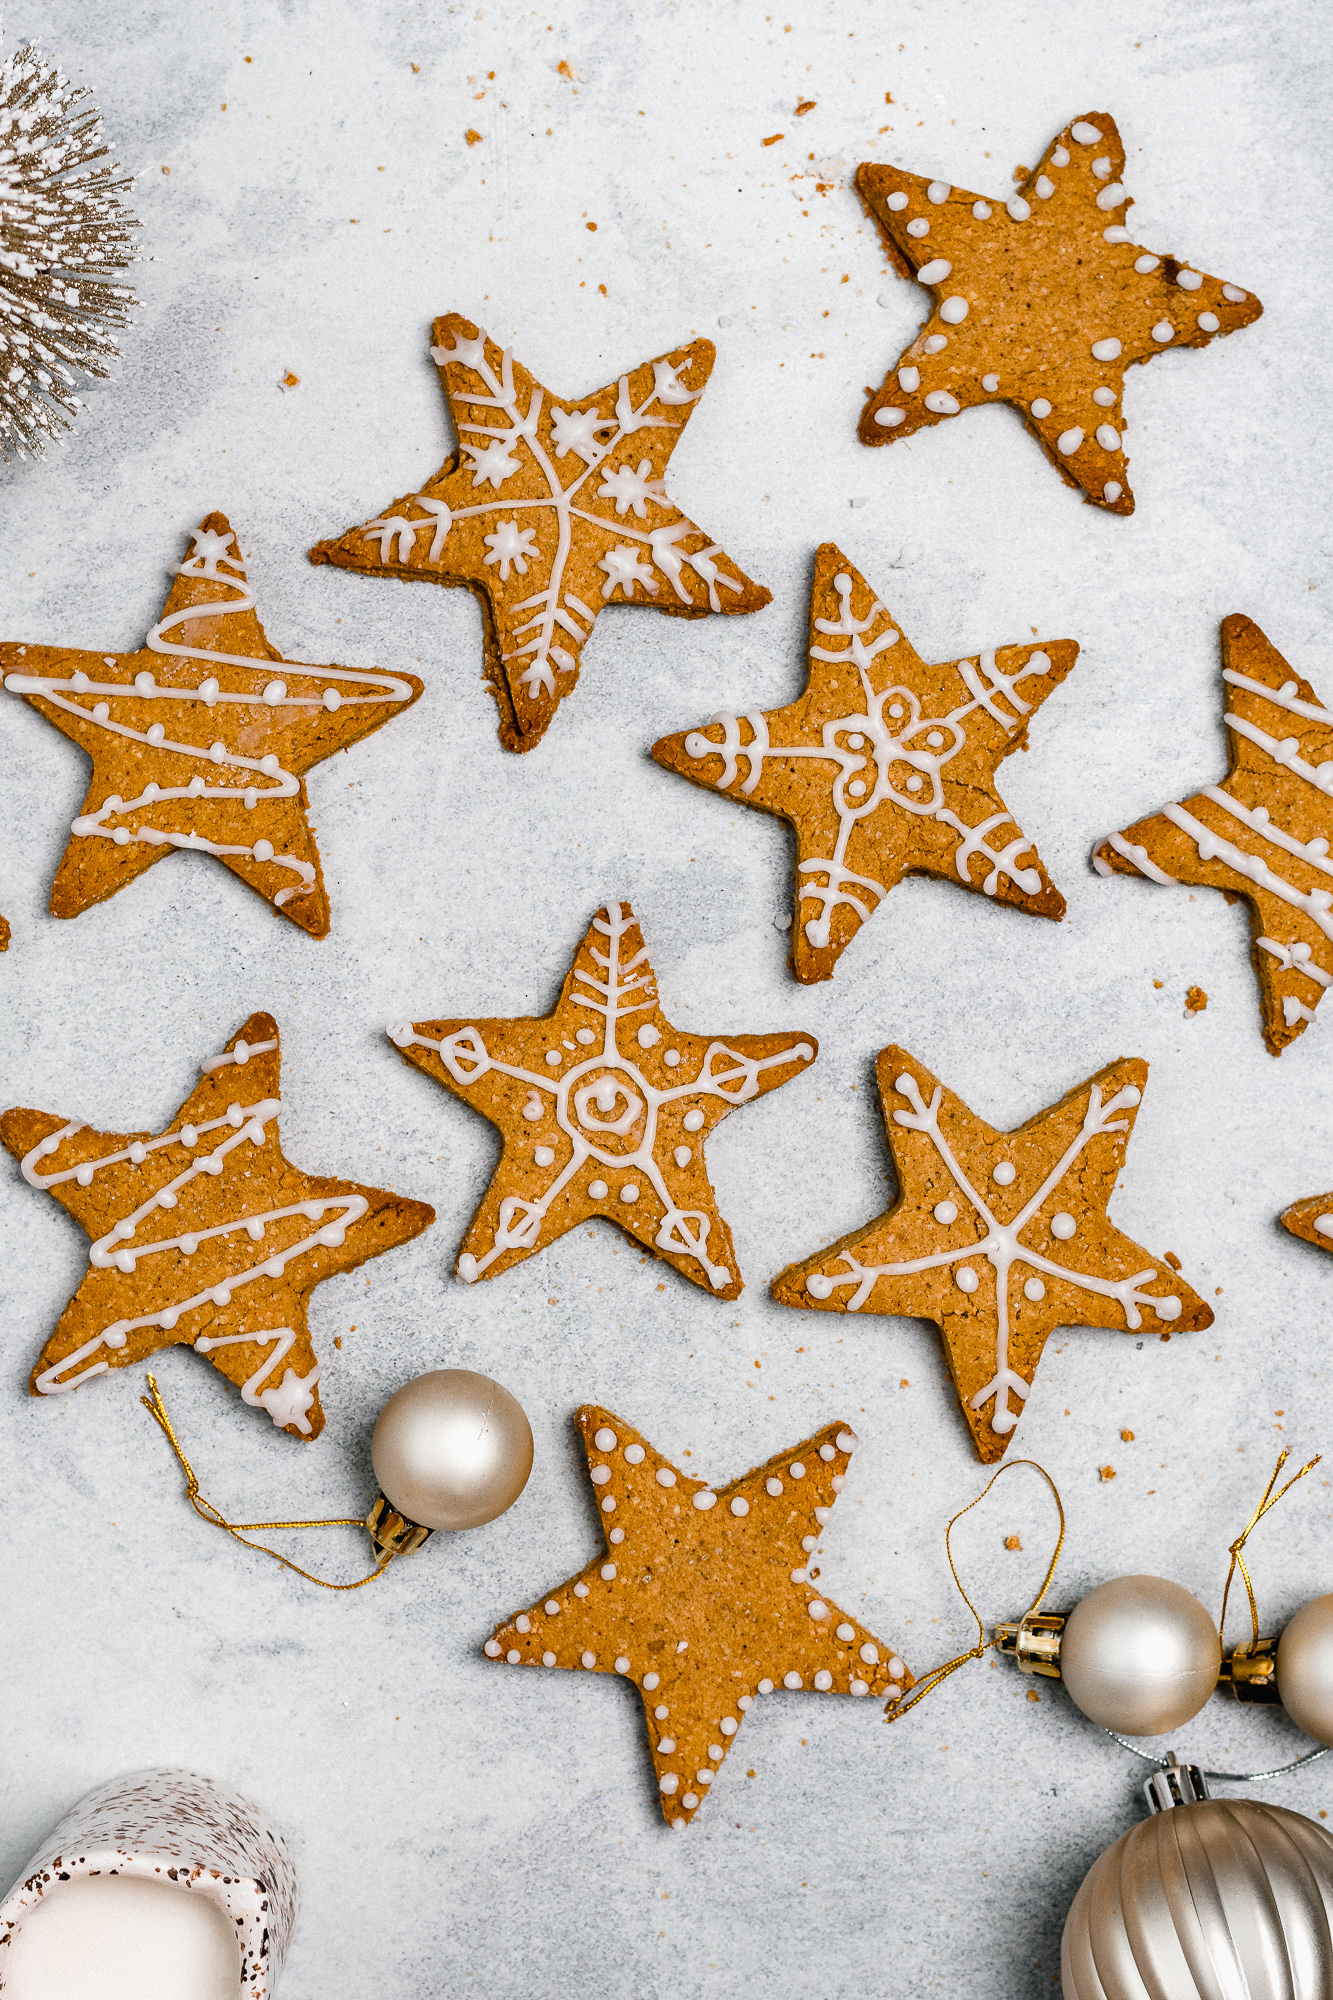 Gluten Free Christmas Gingerbread Cookies